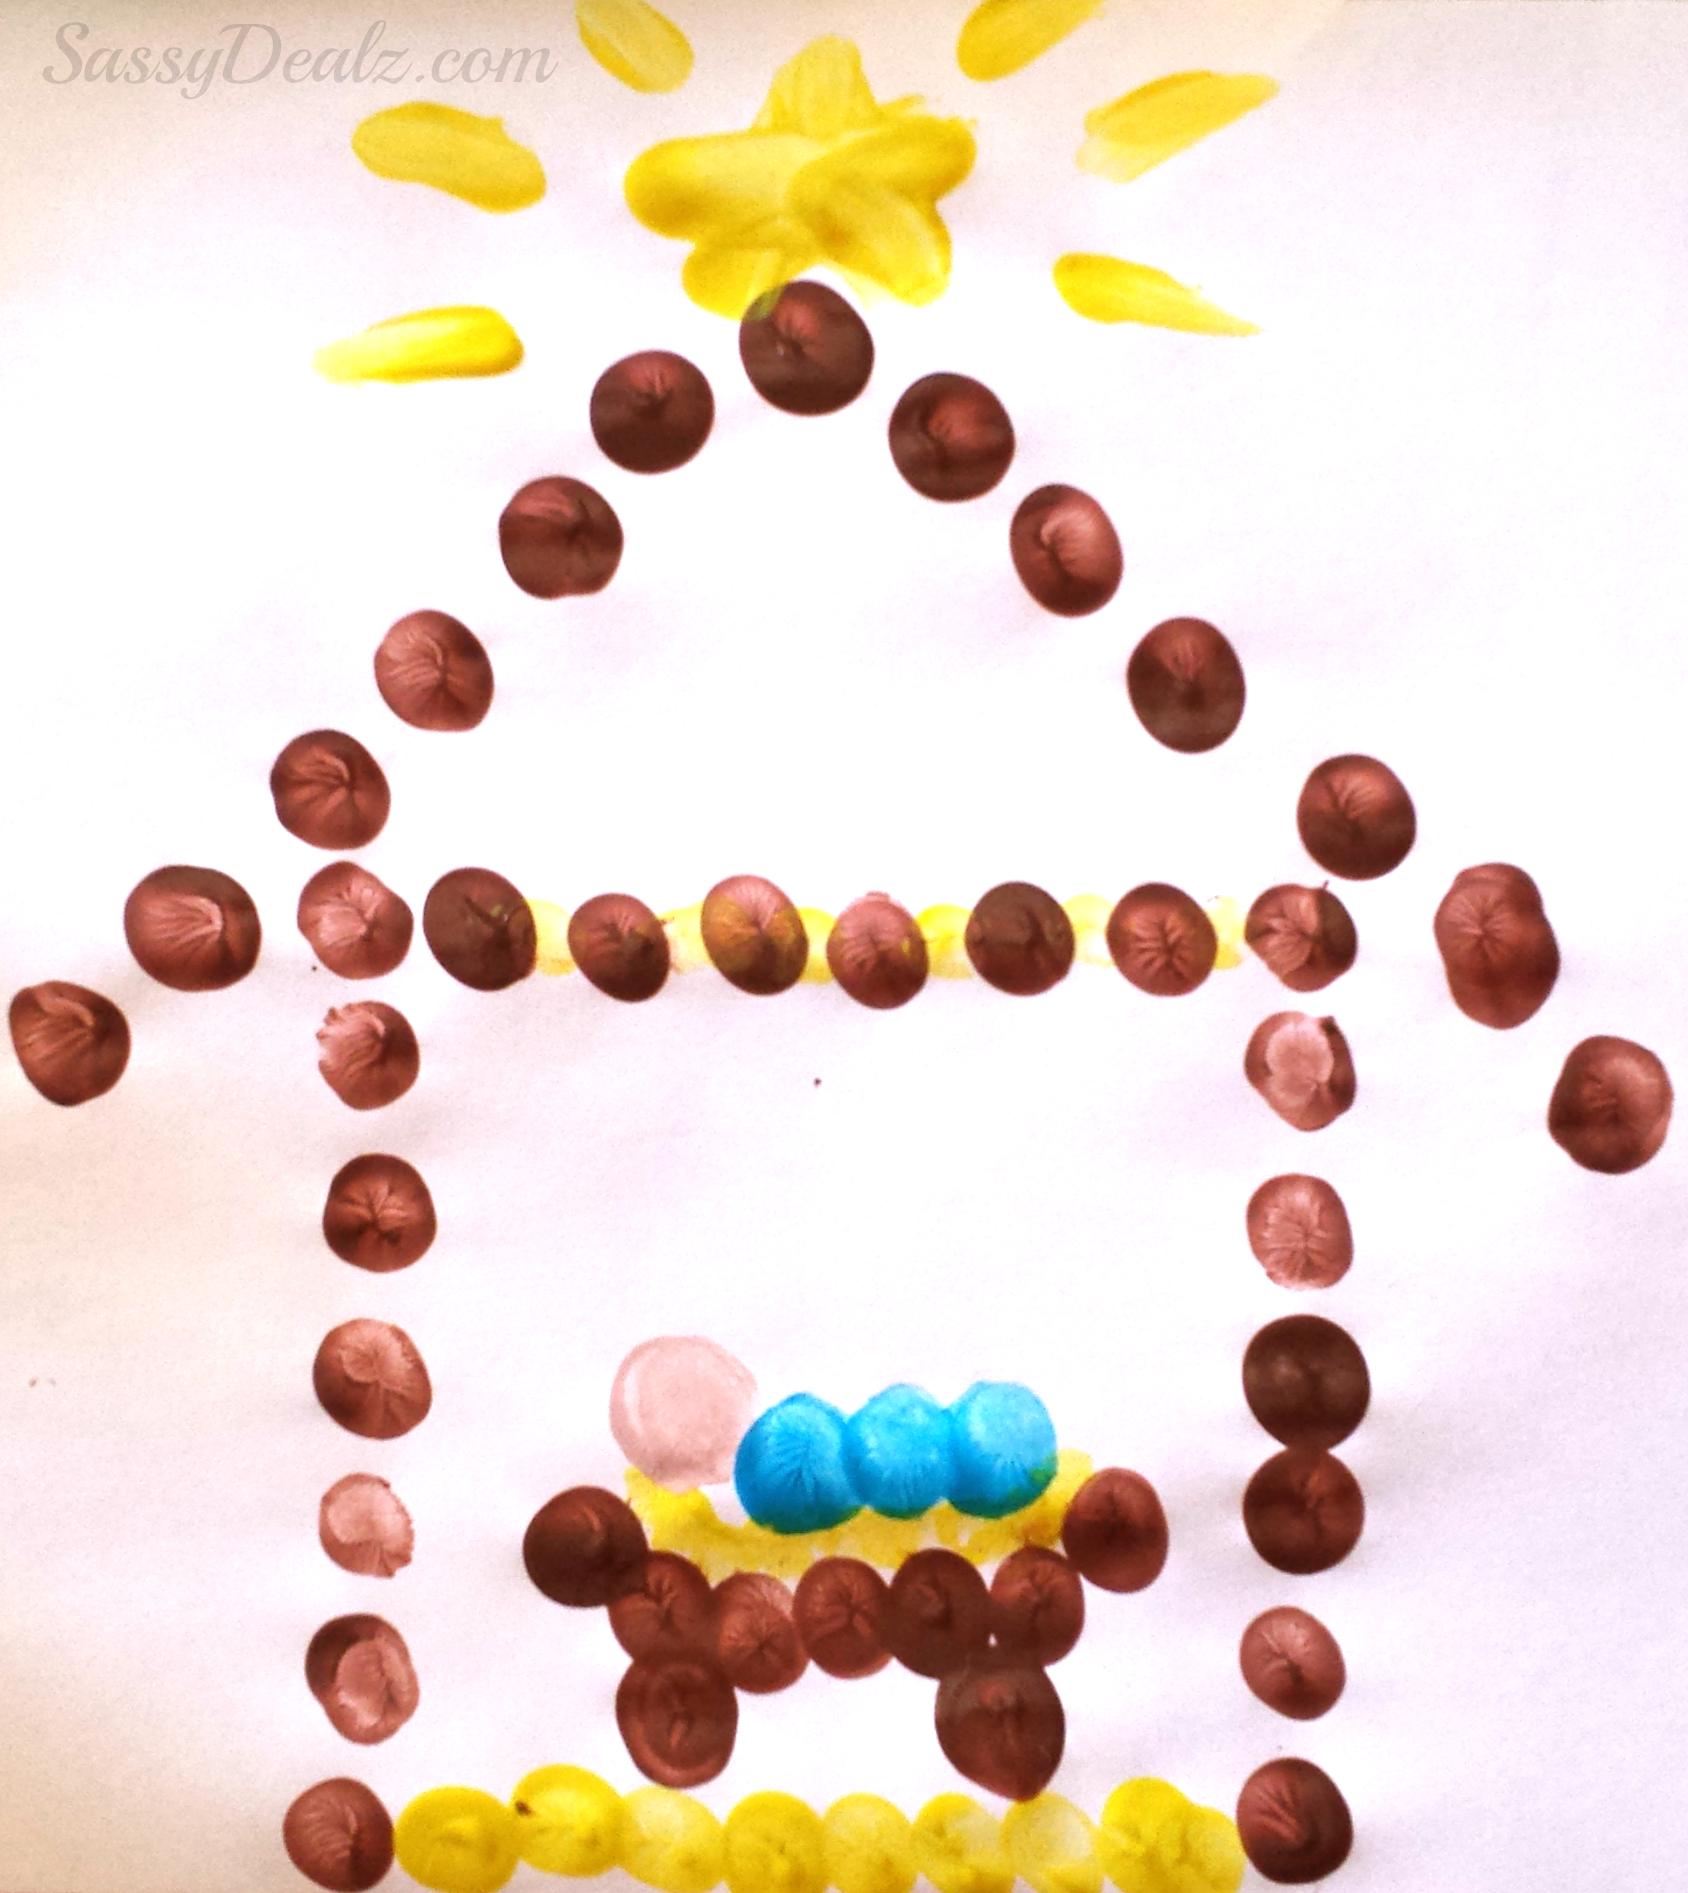 Baby Jesus in a Manger Fingerprint Craft For Kids #Christmas craft ...